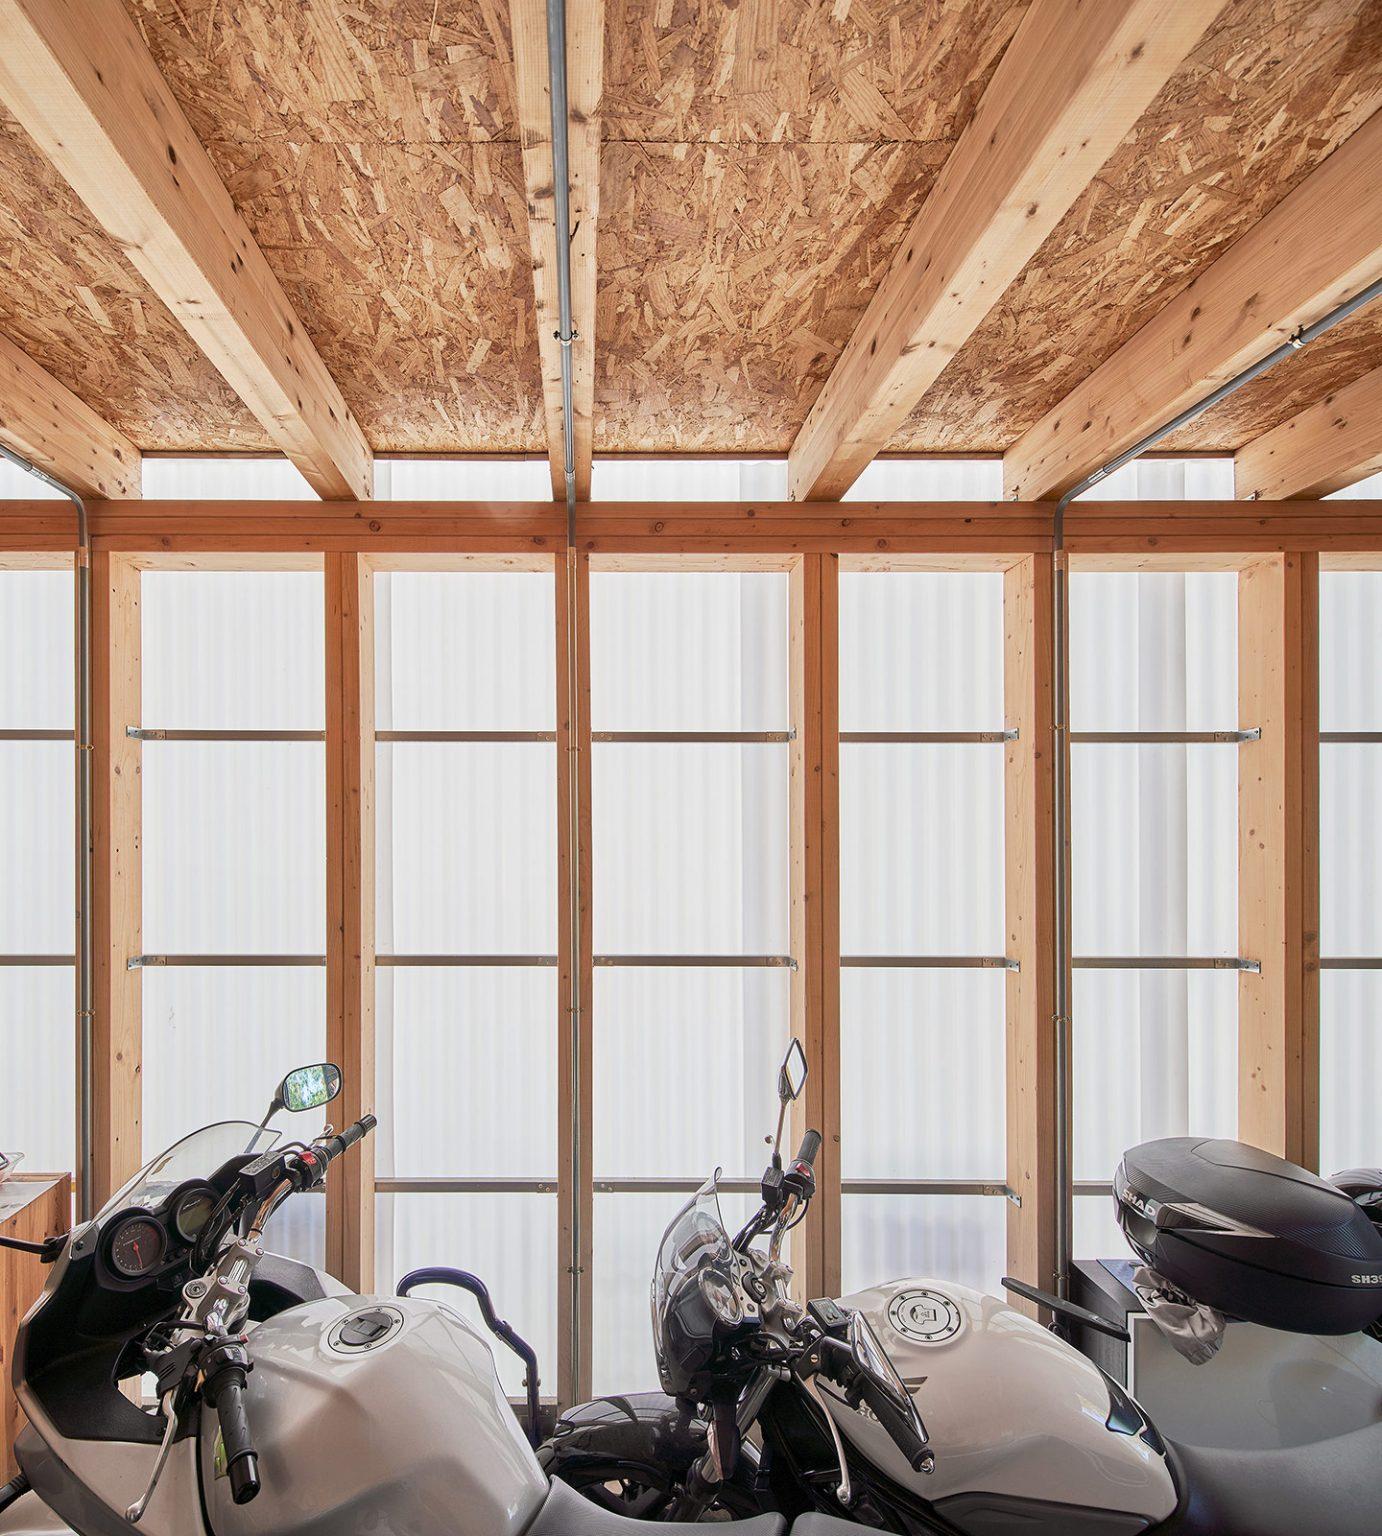 taller argentona casa passiva papik cases passives catalunya casa biopassiva casa eficient